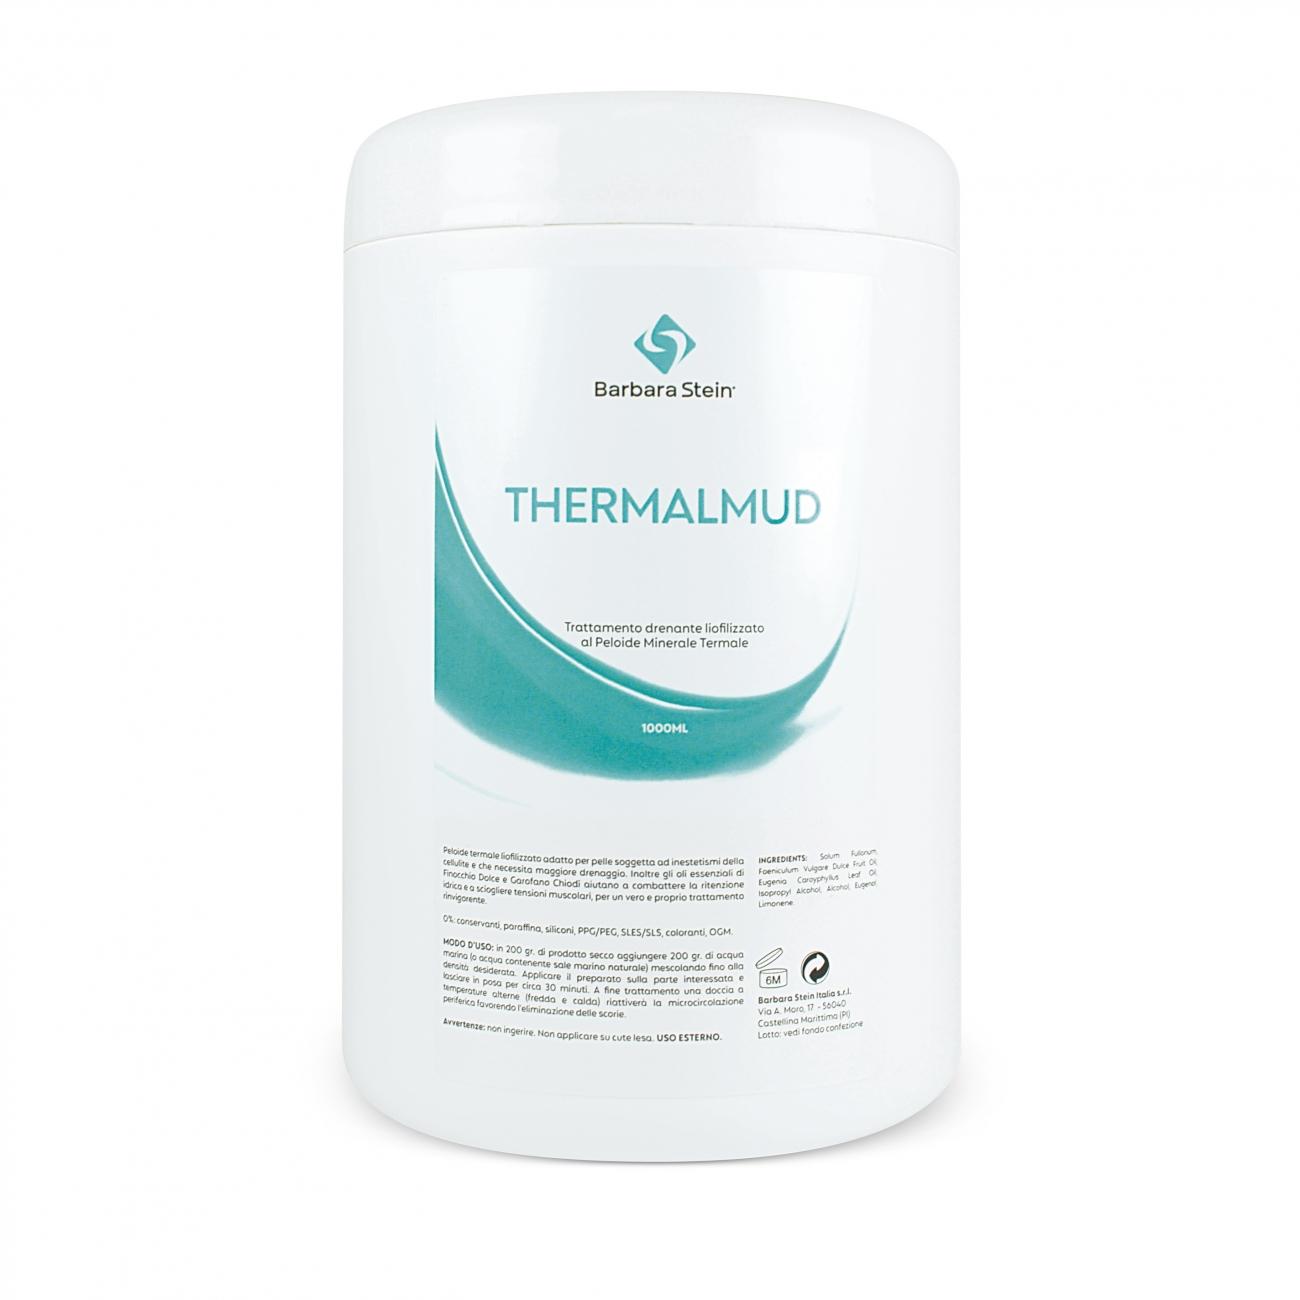 THERMALMUD (1000 ml)